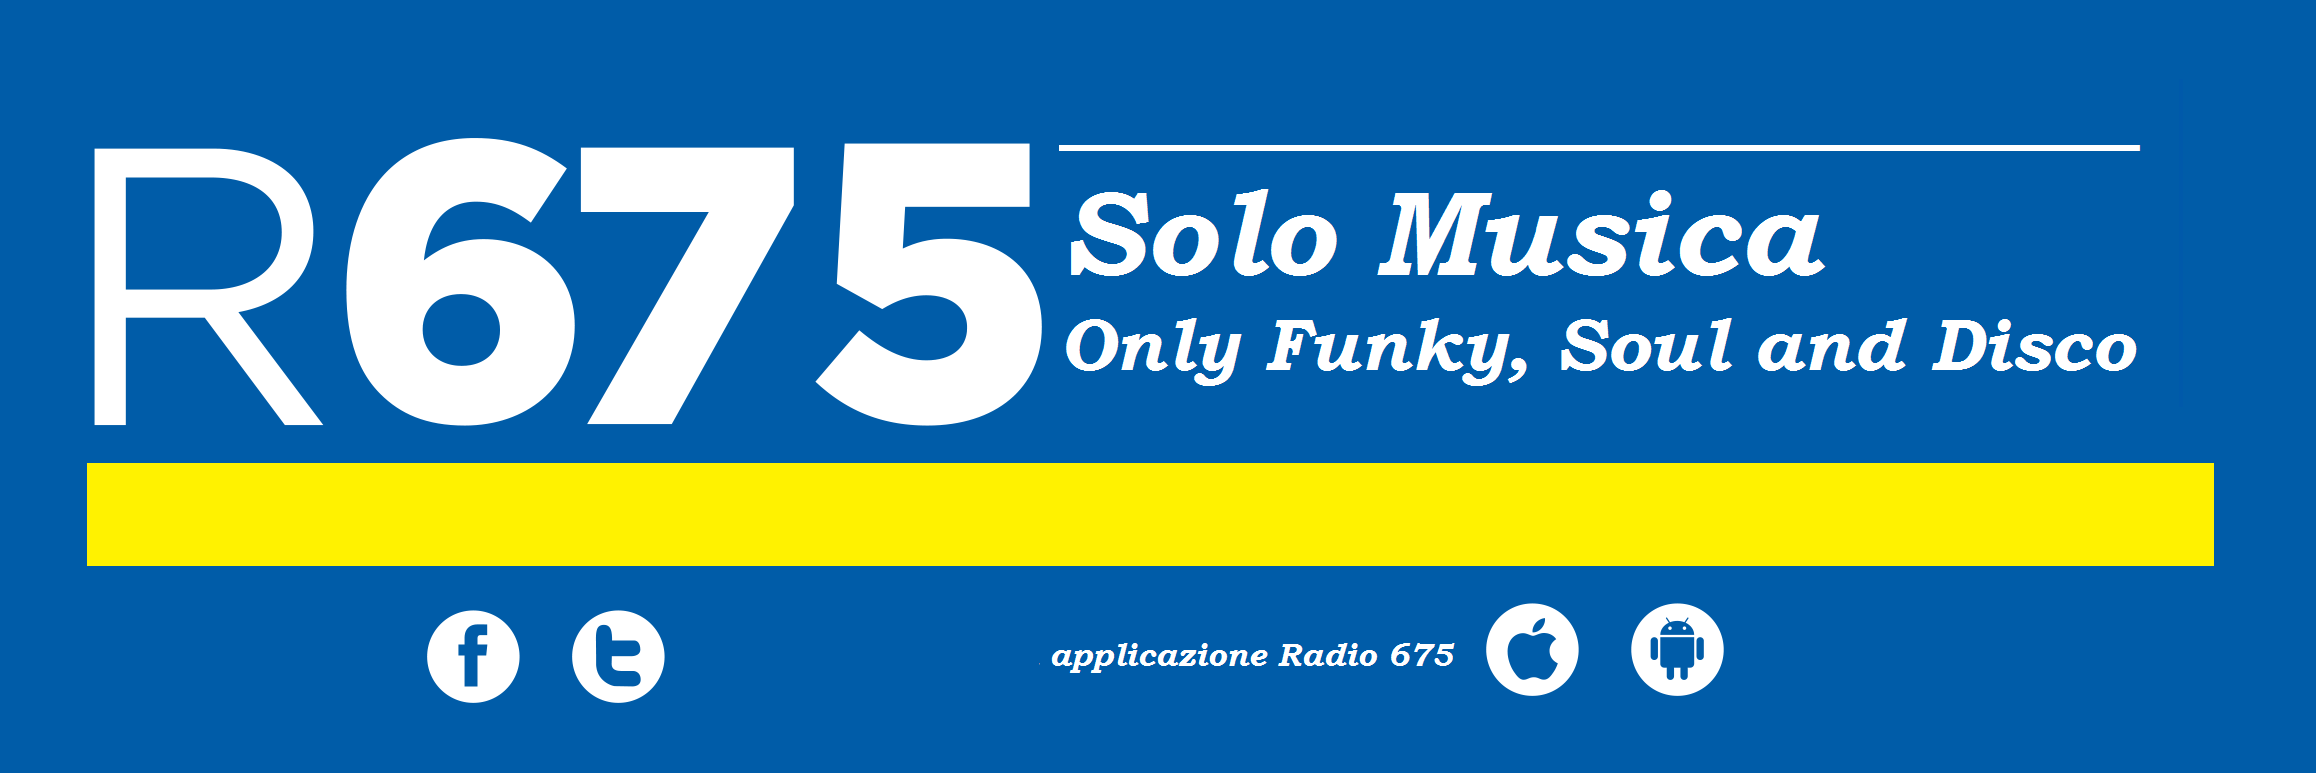 logo-radio-675smxweb